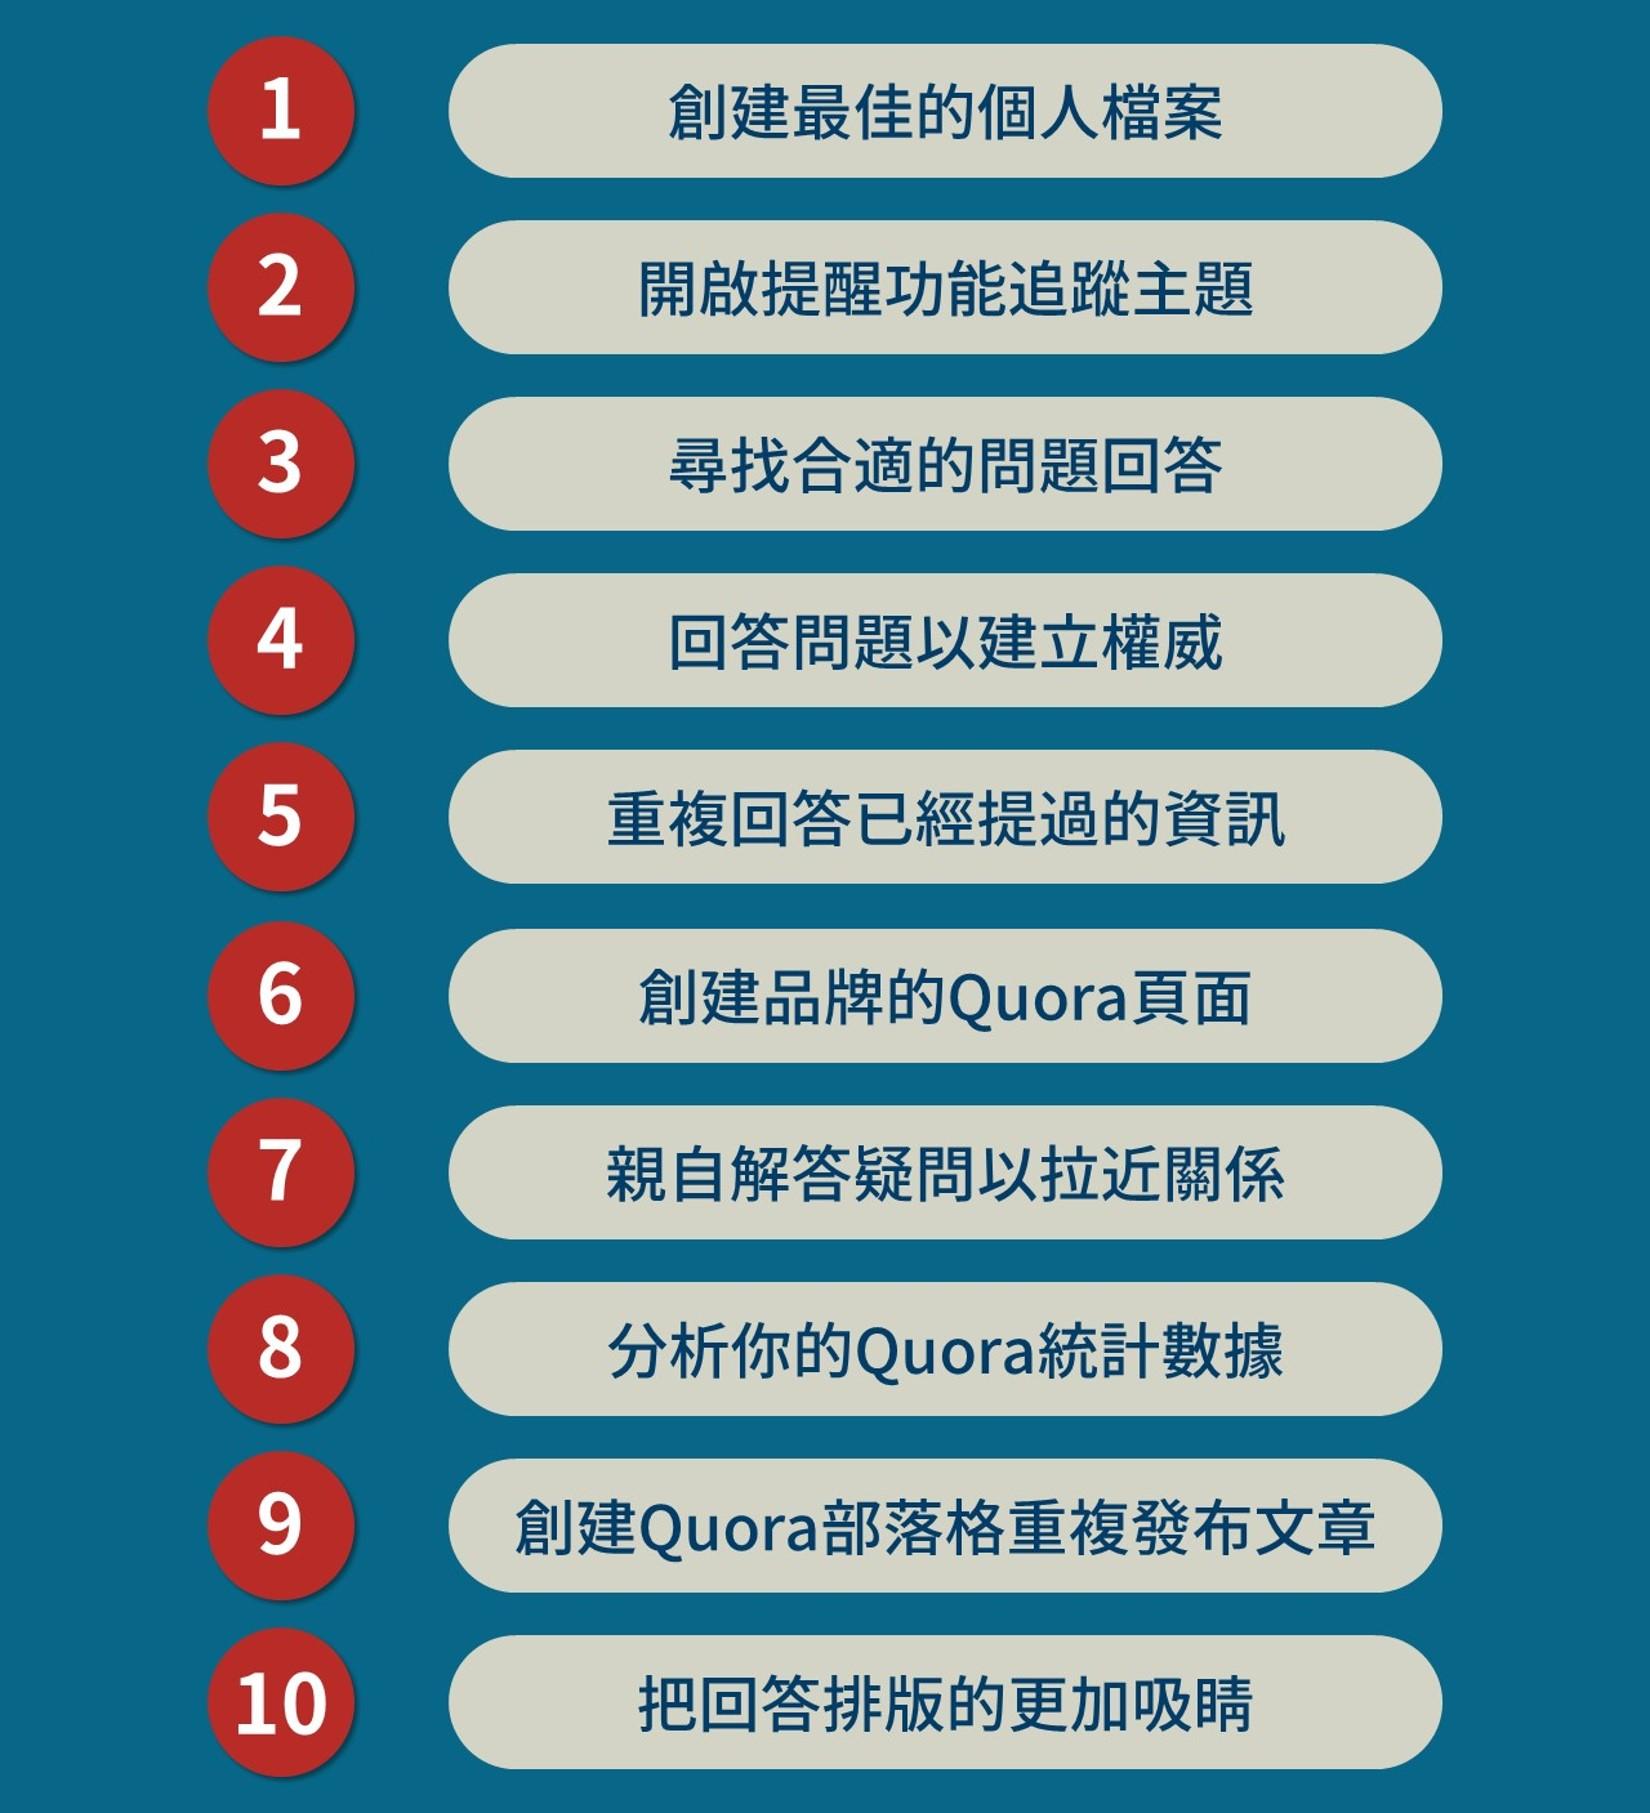 10招使用Quora营销的技巧.png